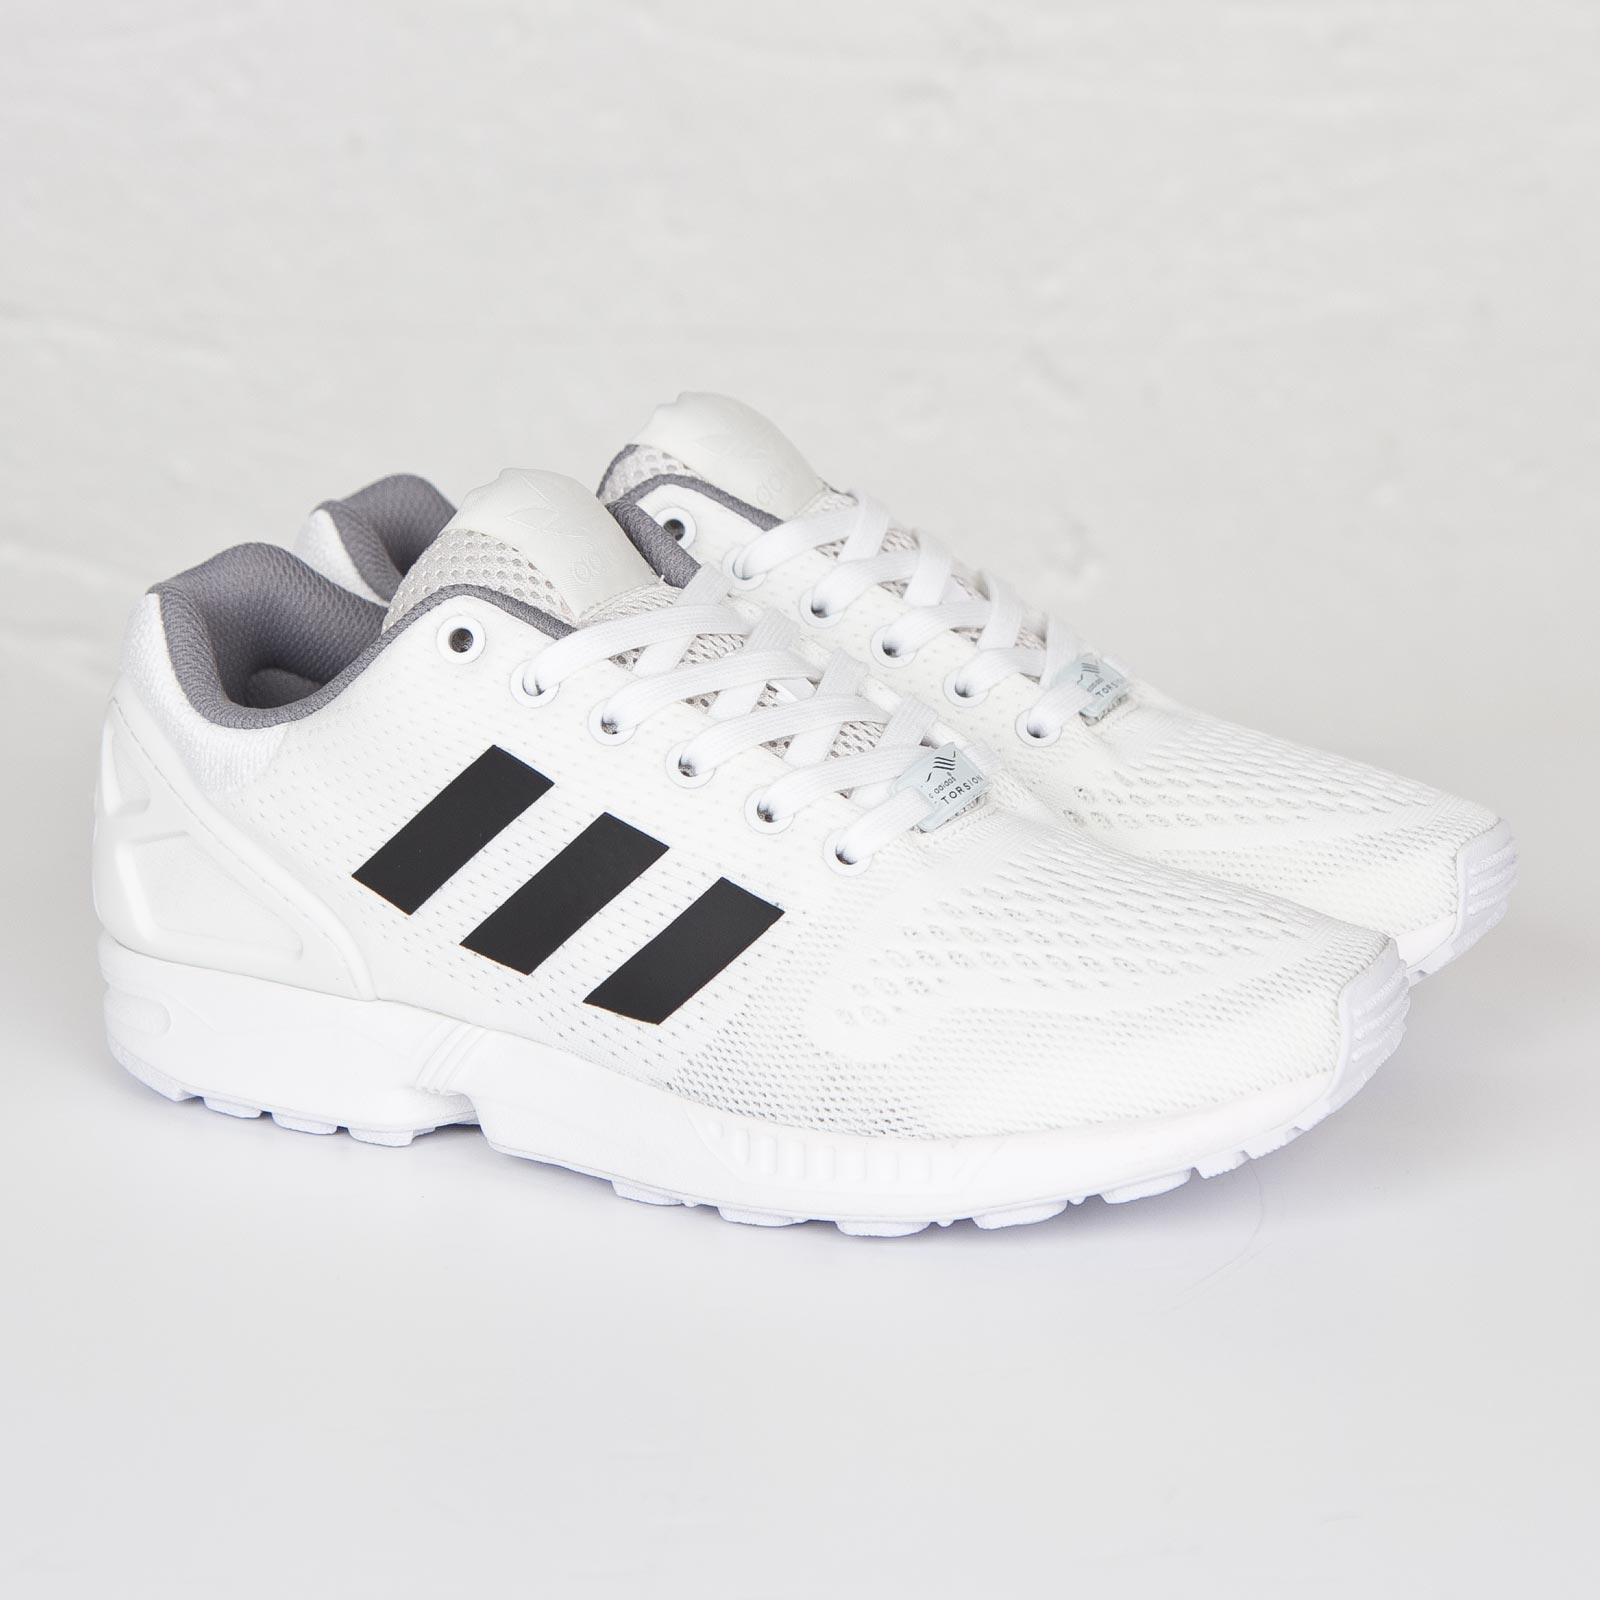 laest technology Rabatt zum Verkauf bieten eine große Auswahl an adidas ZX Flux - B34513 - Sneakersnstuff | sneakers ...